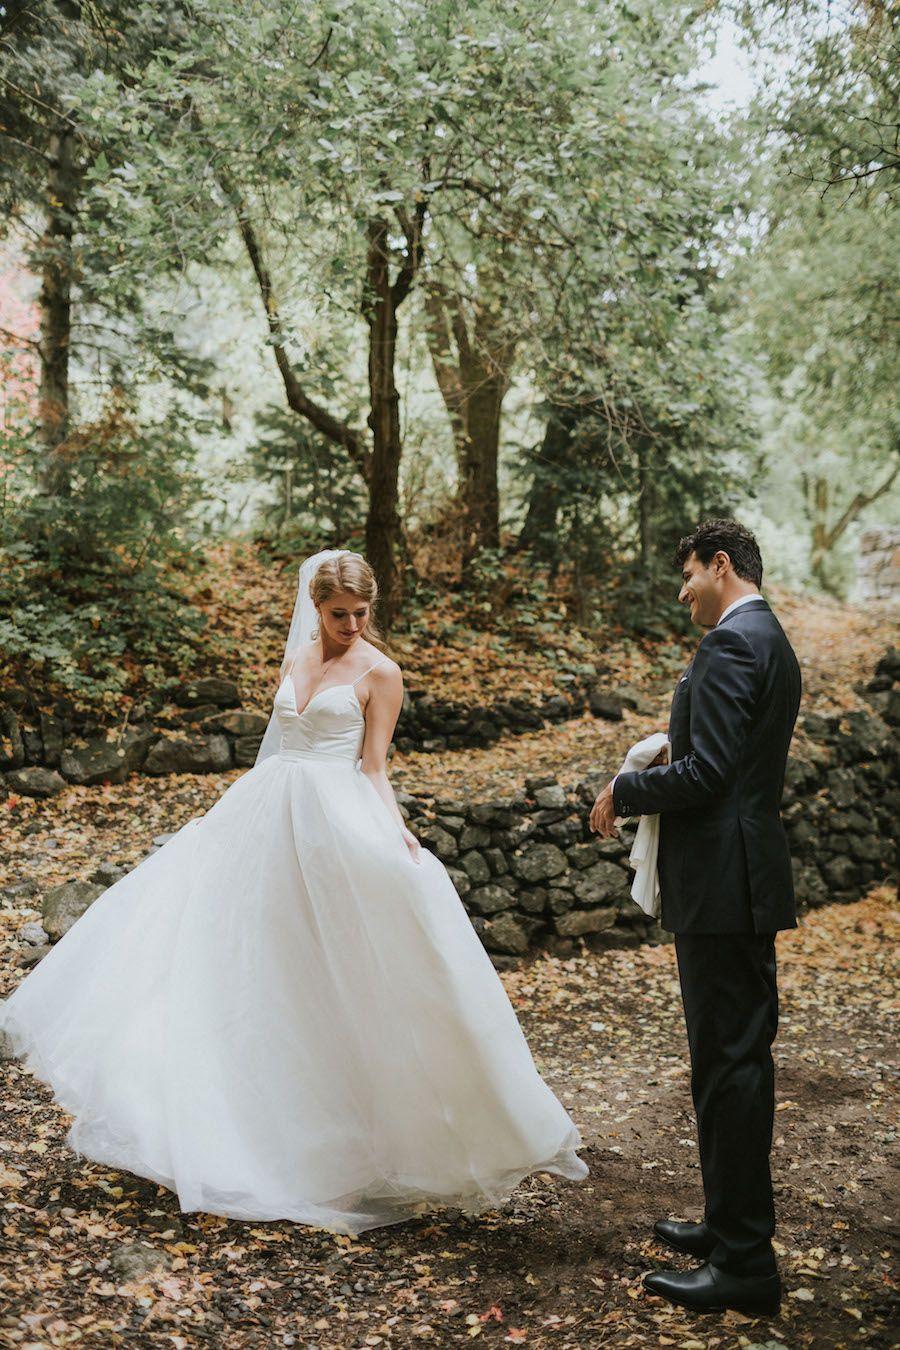 Nature wedding dress  City Meets Nature Wedding Featured on Wedding Chicks  Vivince